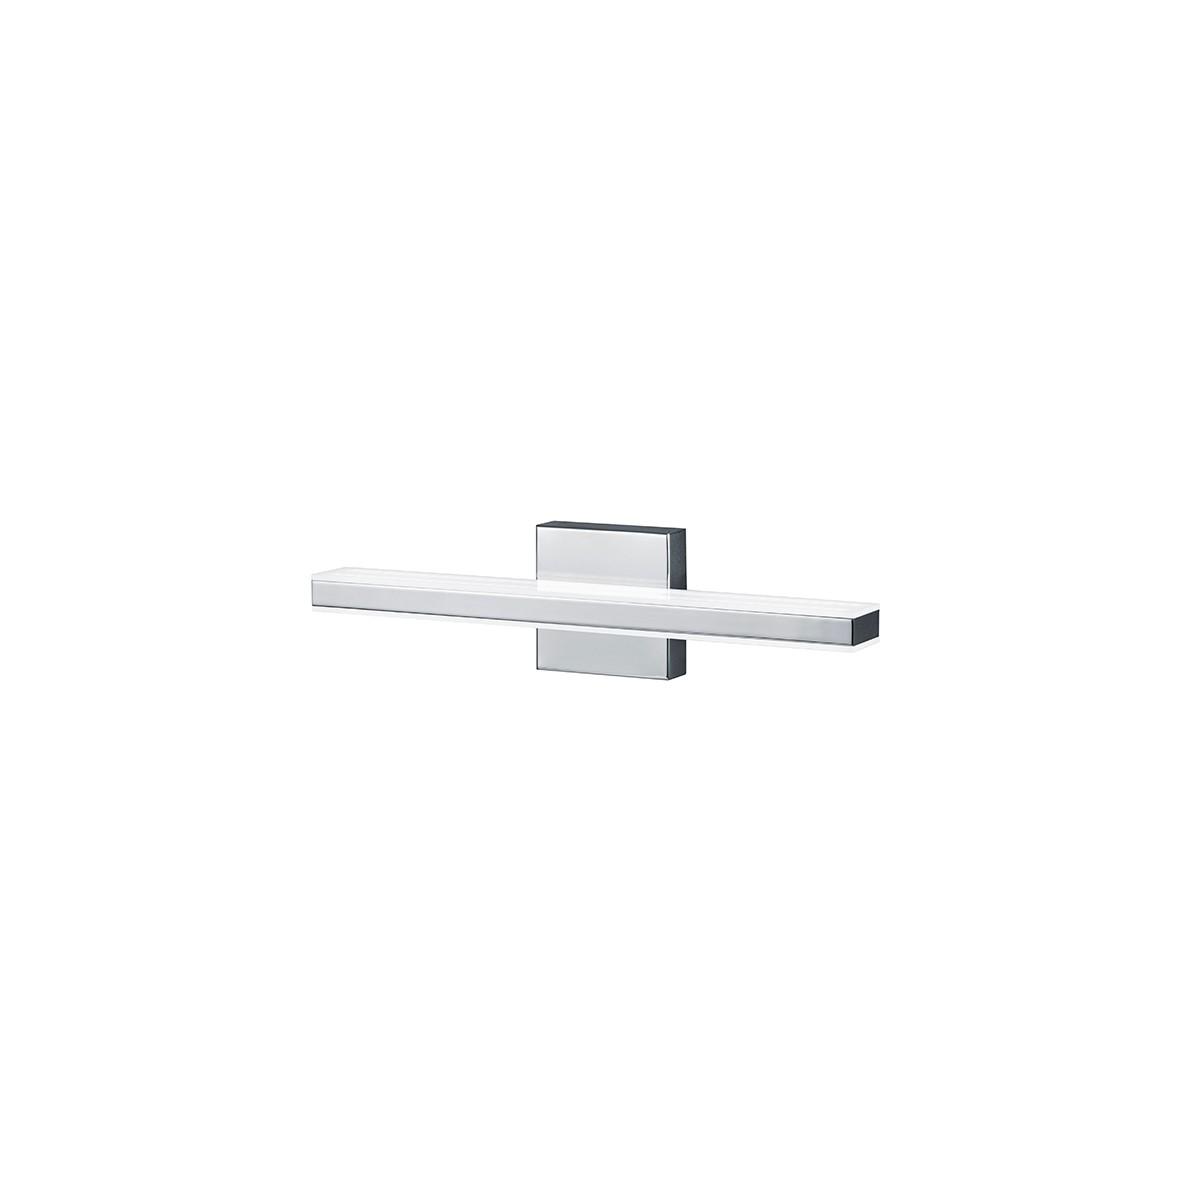 Bankamp Linea Wandleuchte, 44 x 8 cm, Nickel matt / Chrom